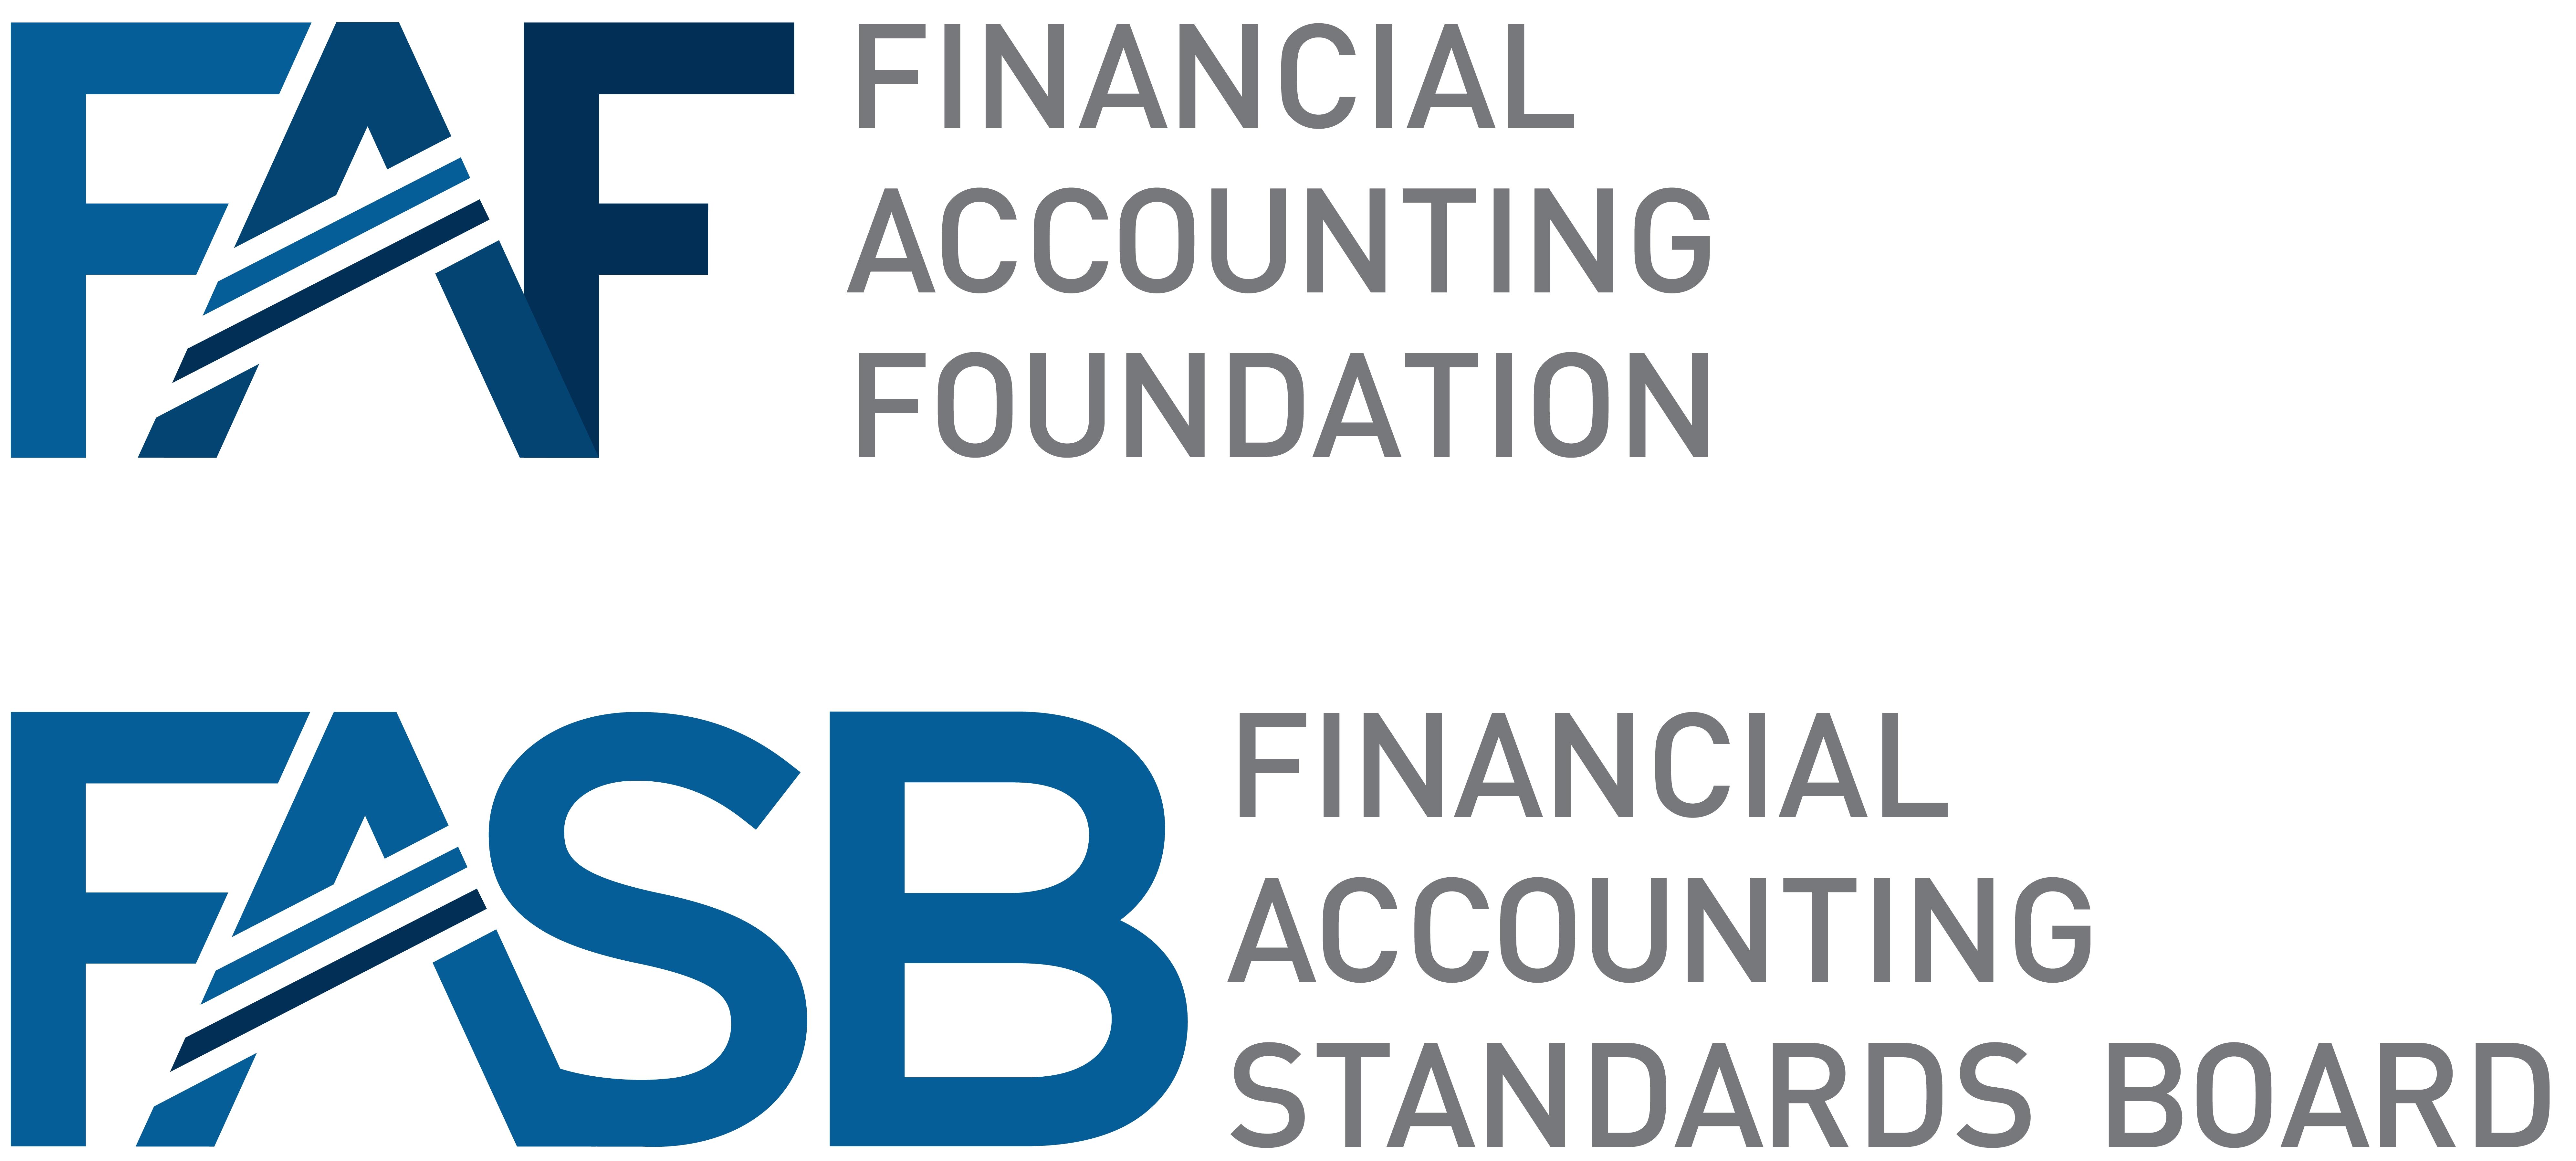 Financial accounting standards board essay